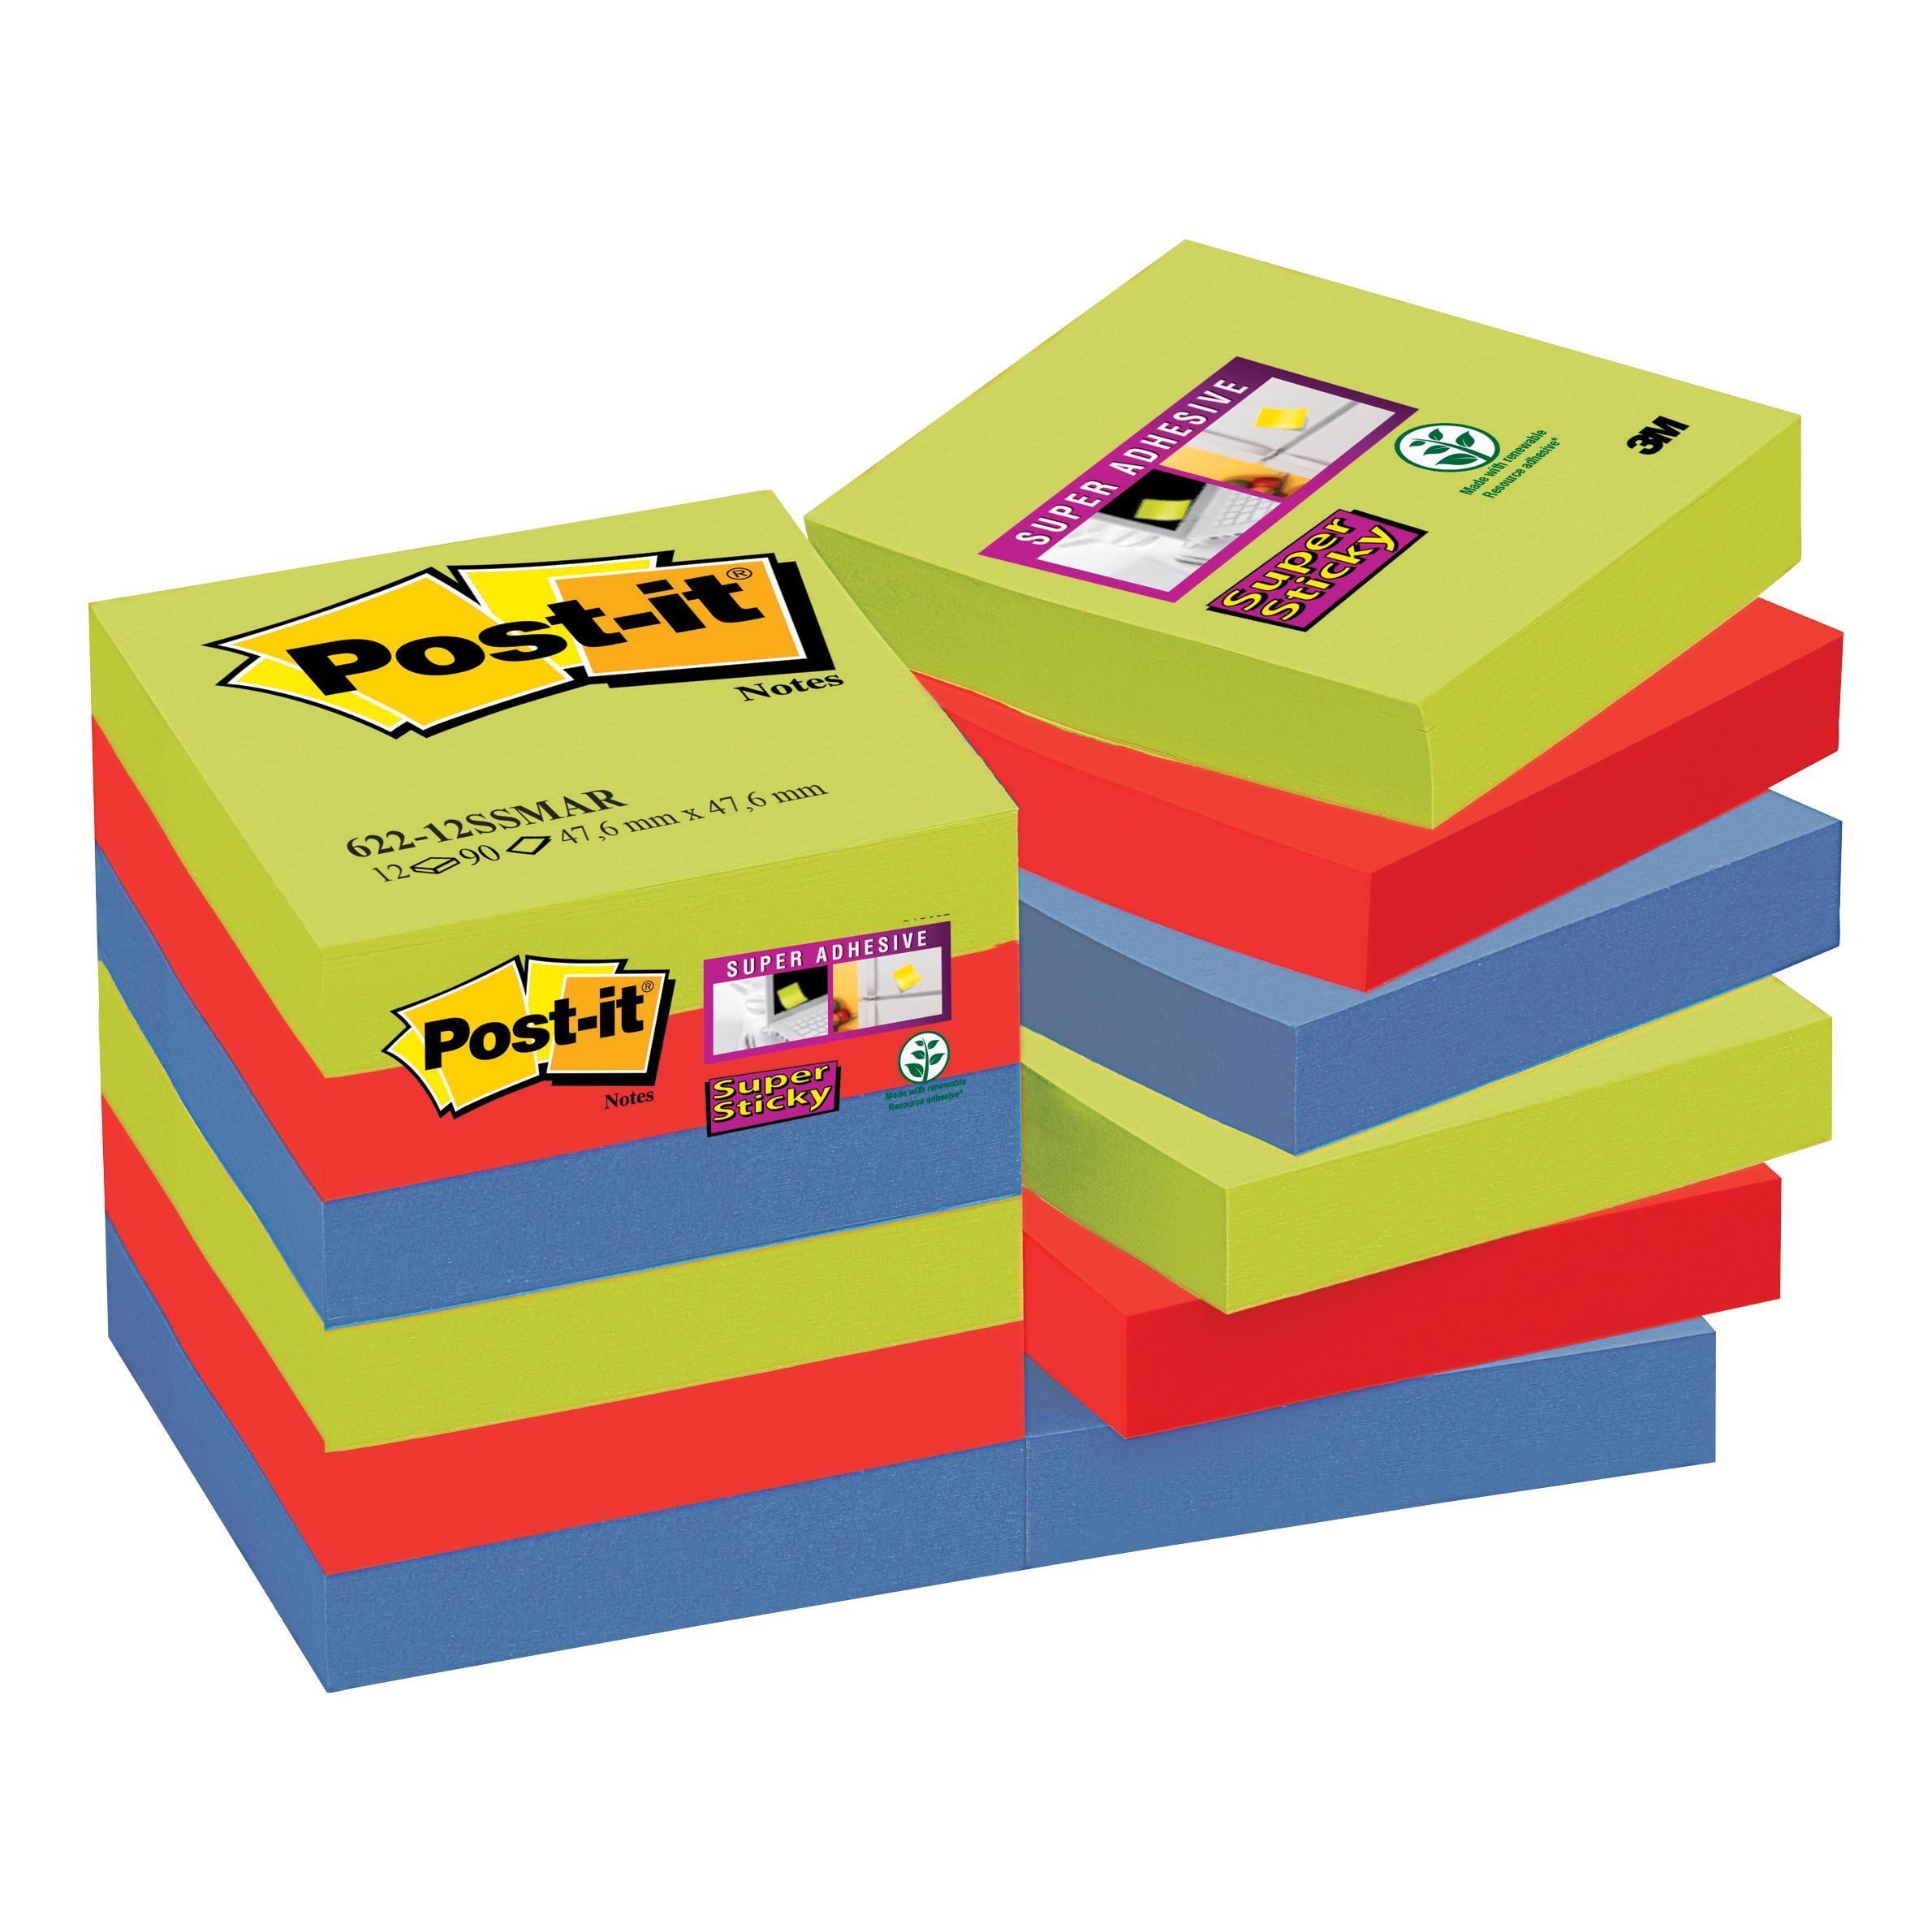 Post-it Super Sticky Notes Marrakesh 47.6x47.6mm Ref 622-12SSMAR Pack 12